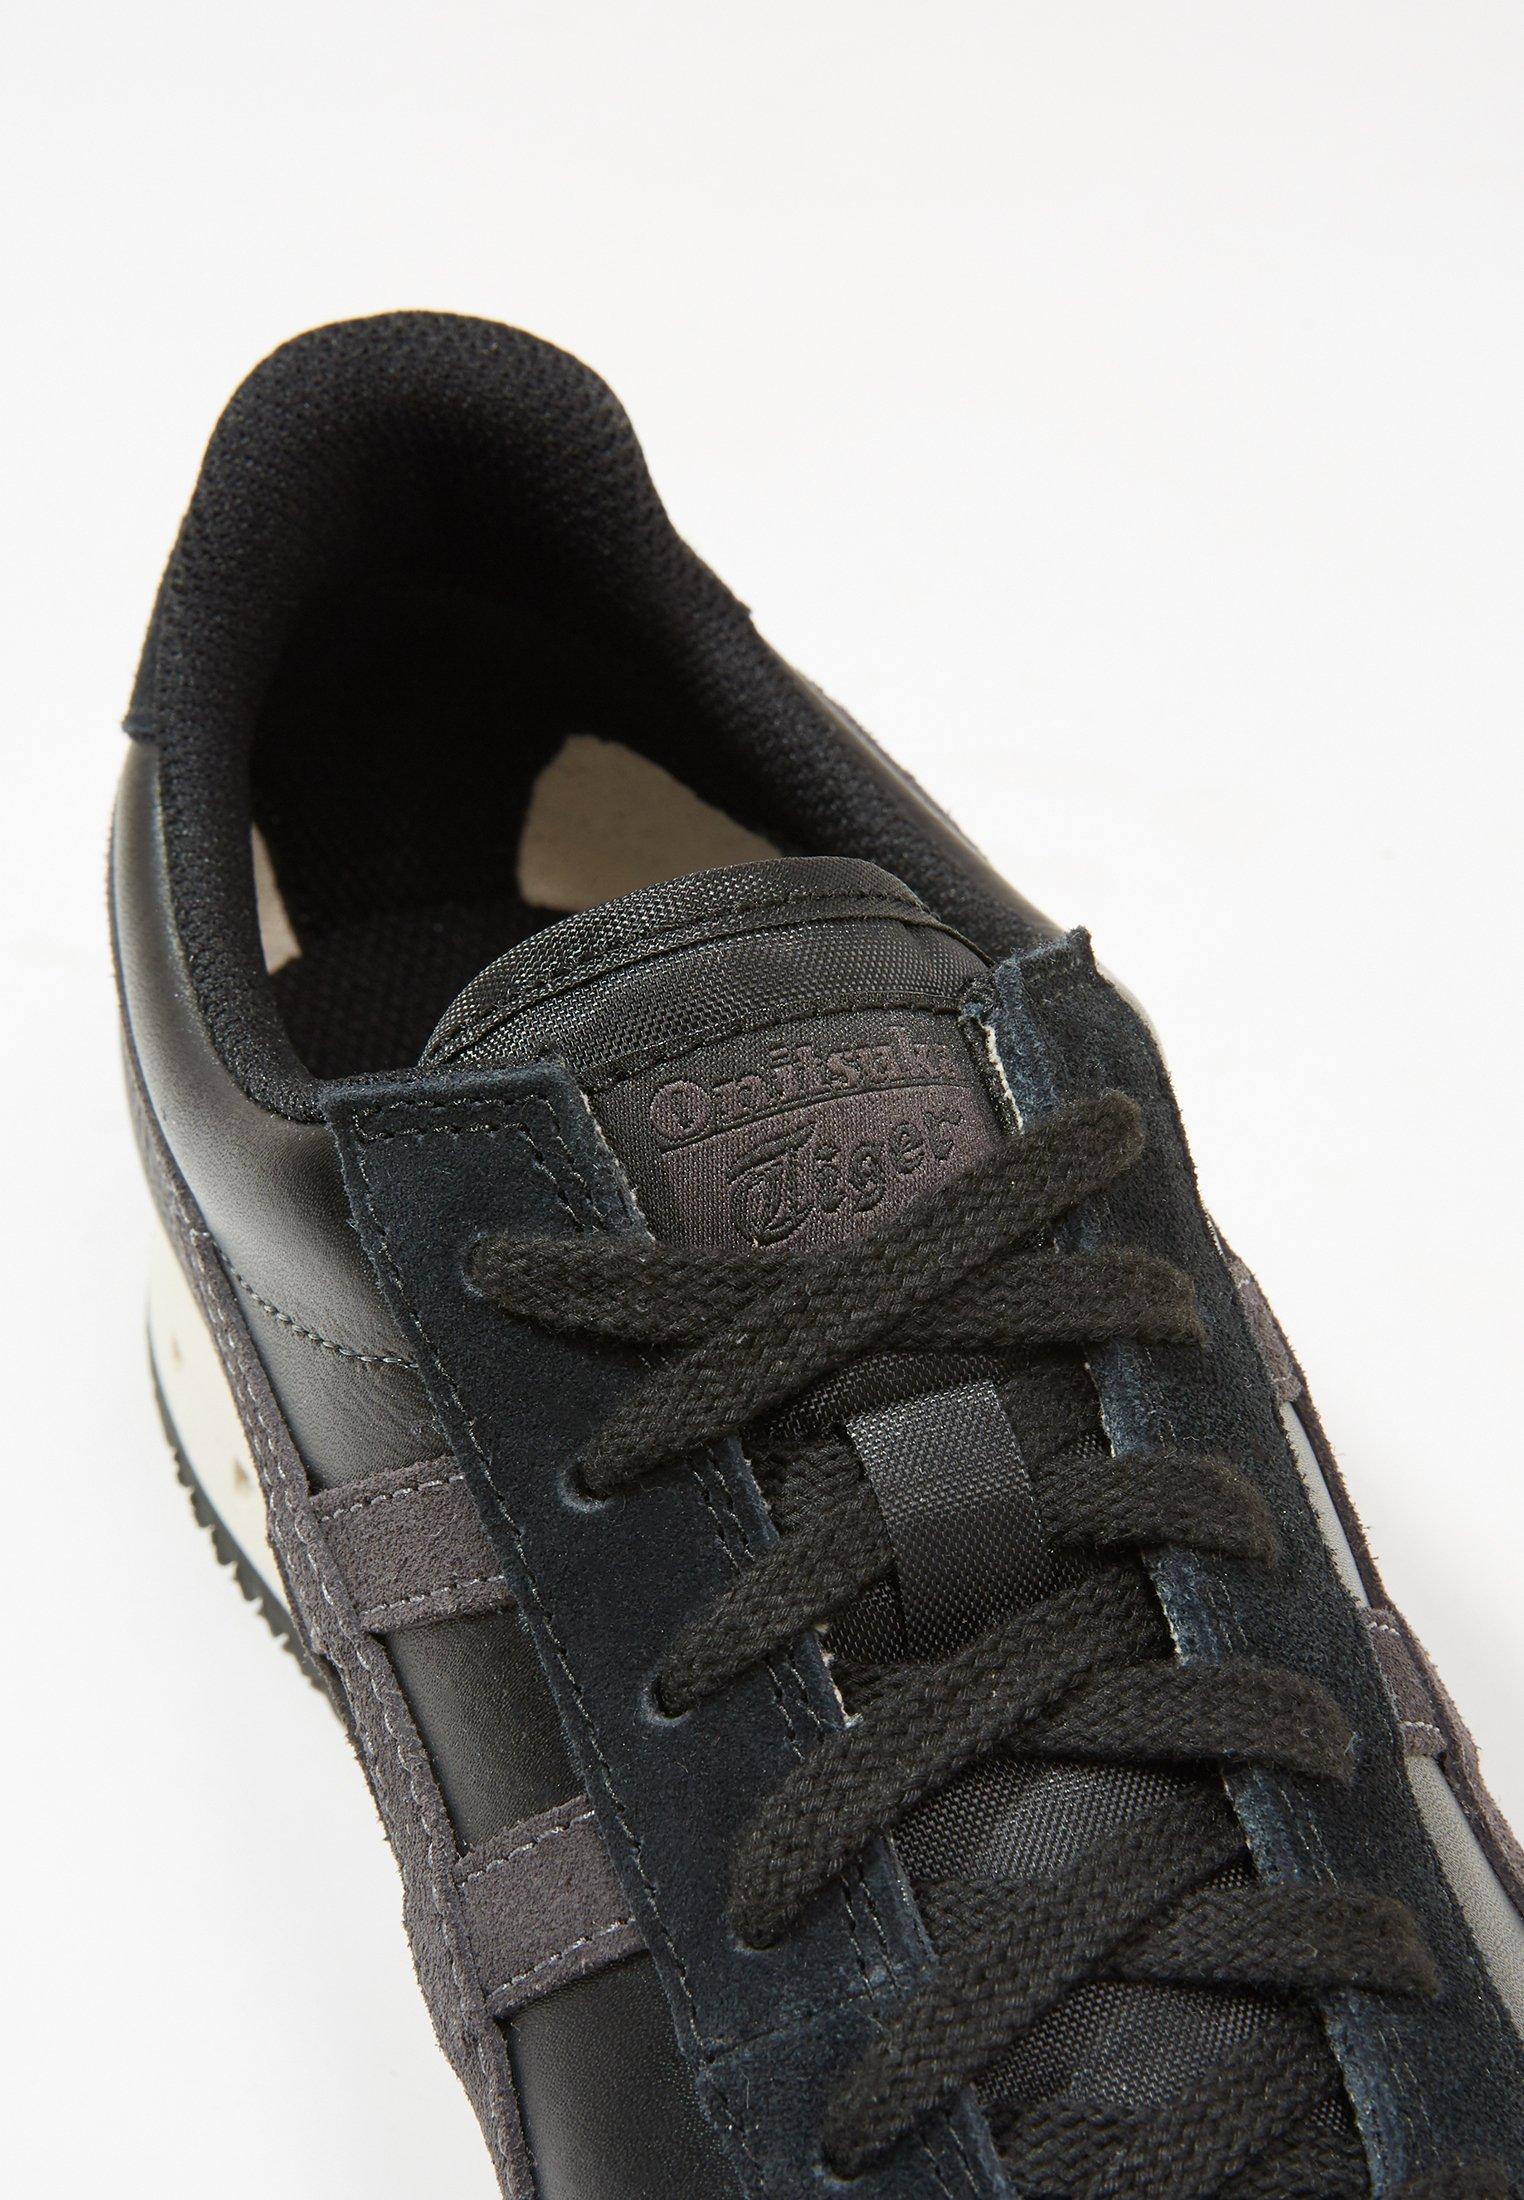 onitsuka tiger mexico 66 new york zalando jumpsuit black